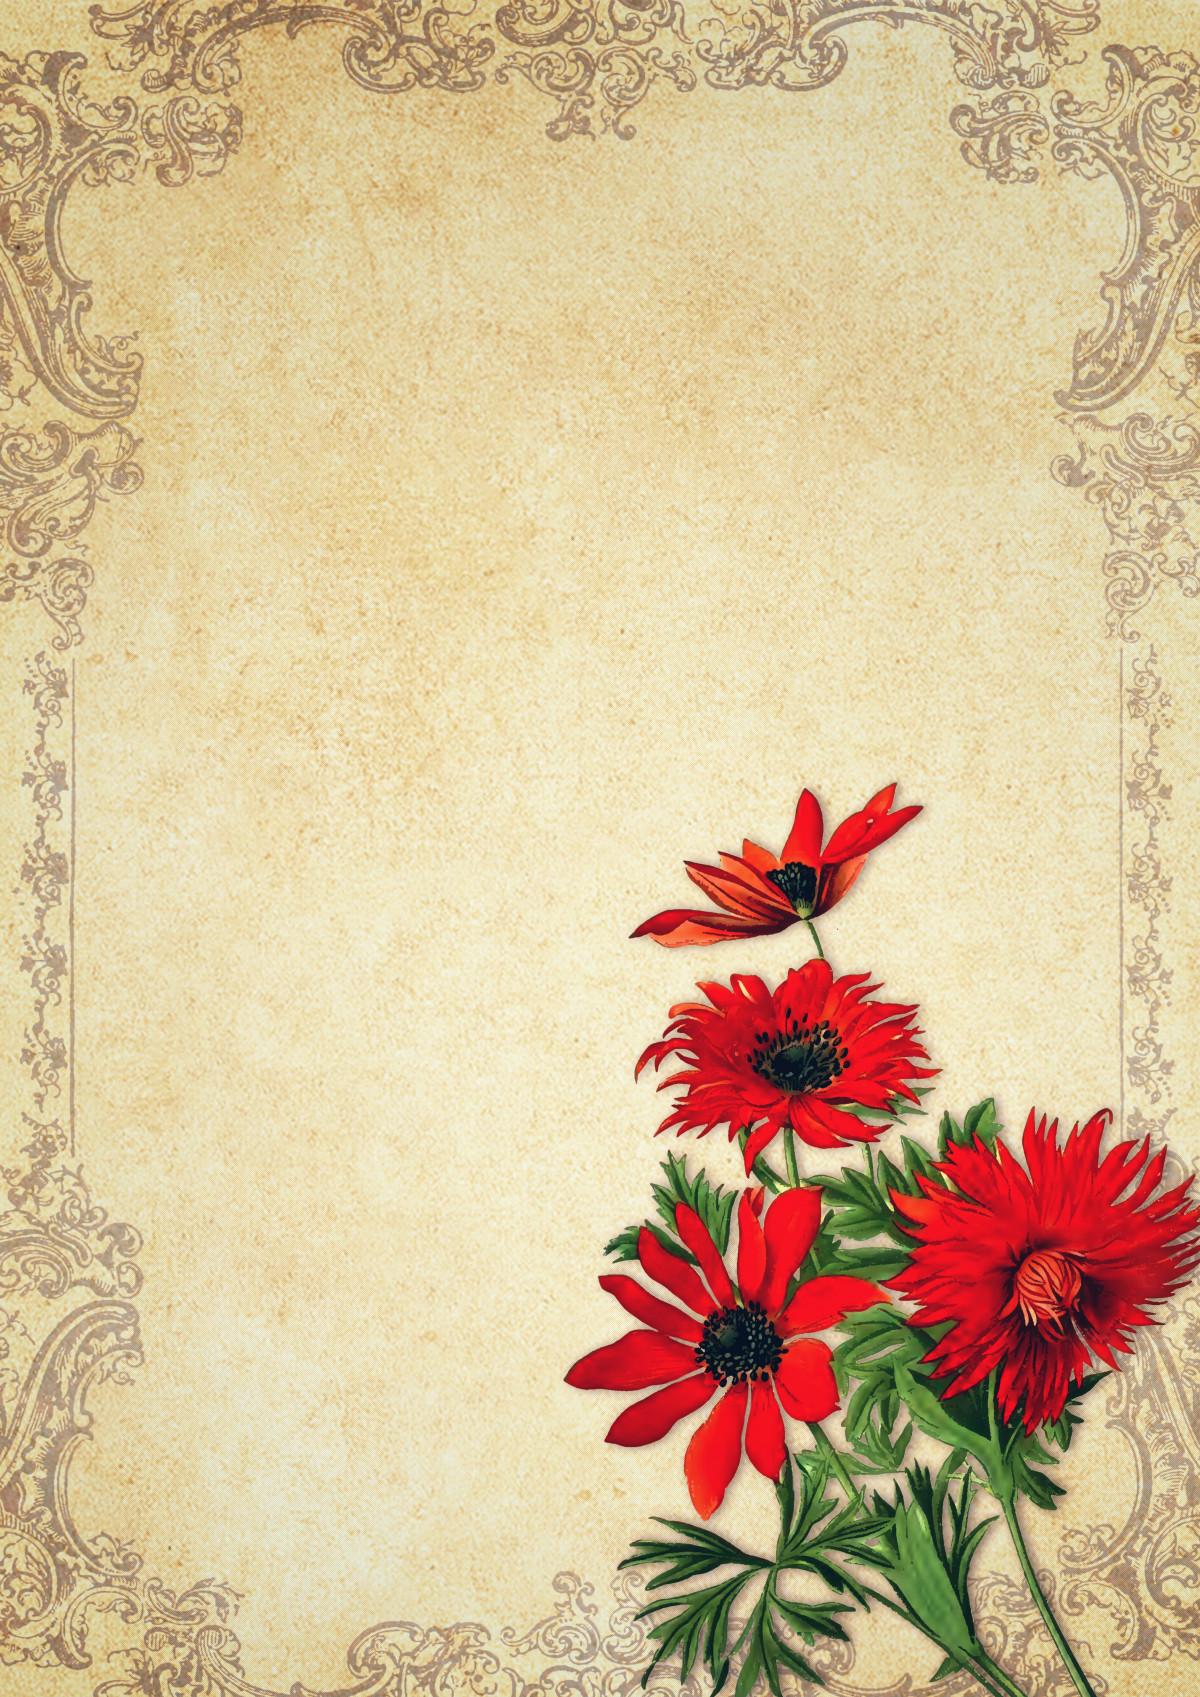 Gambar Vintage Bunga Anemon Hortensis Ornamen Bingkai